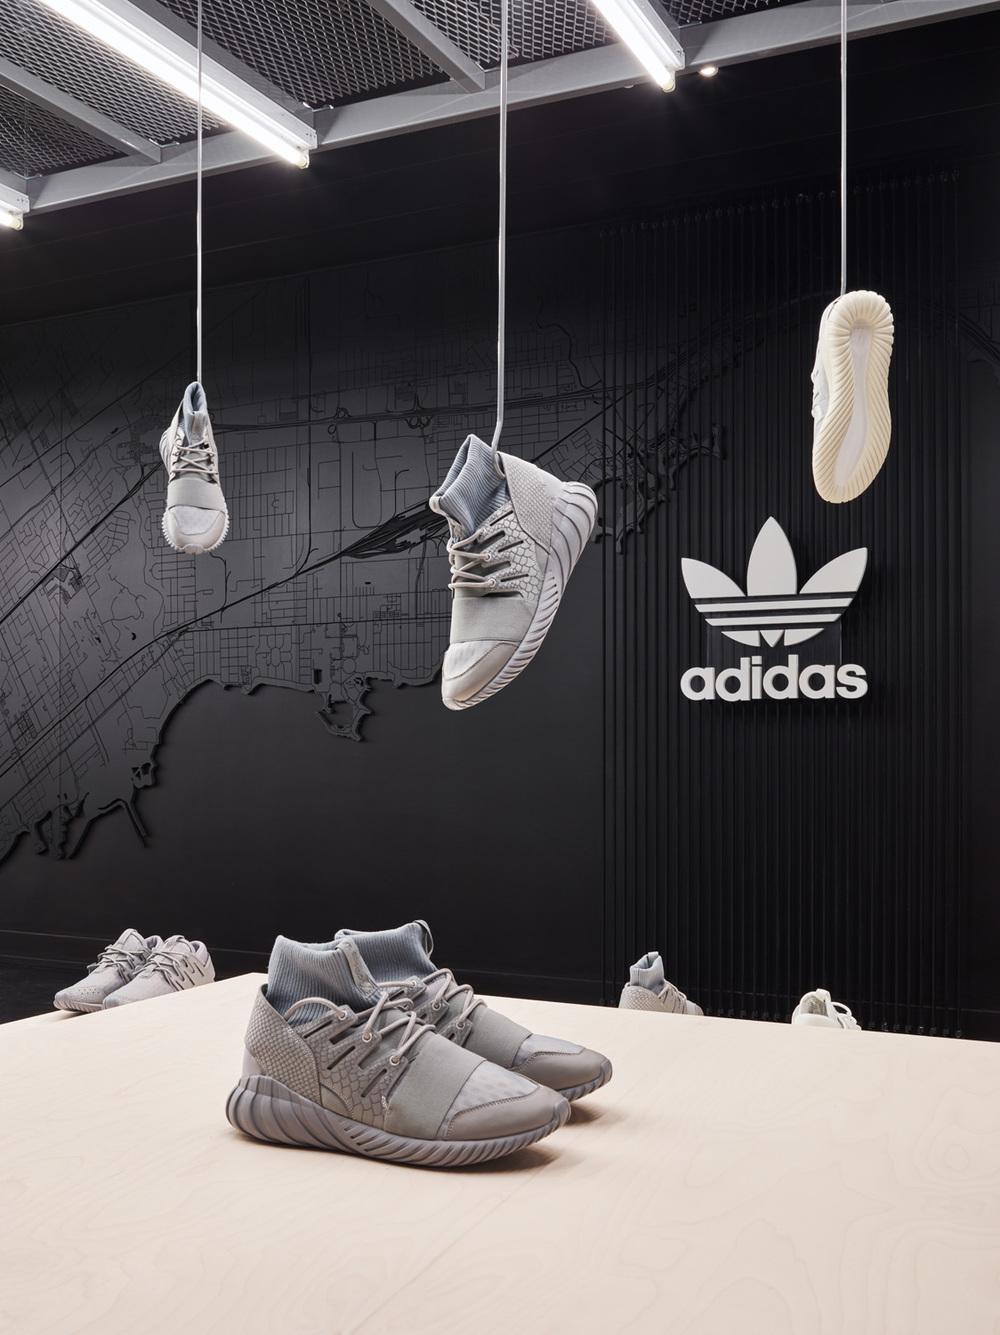 Adidas Exclucity